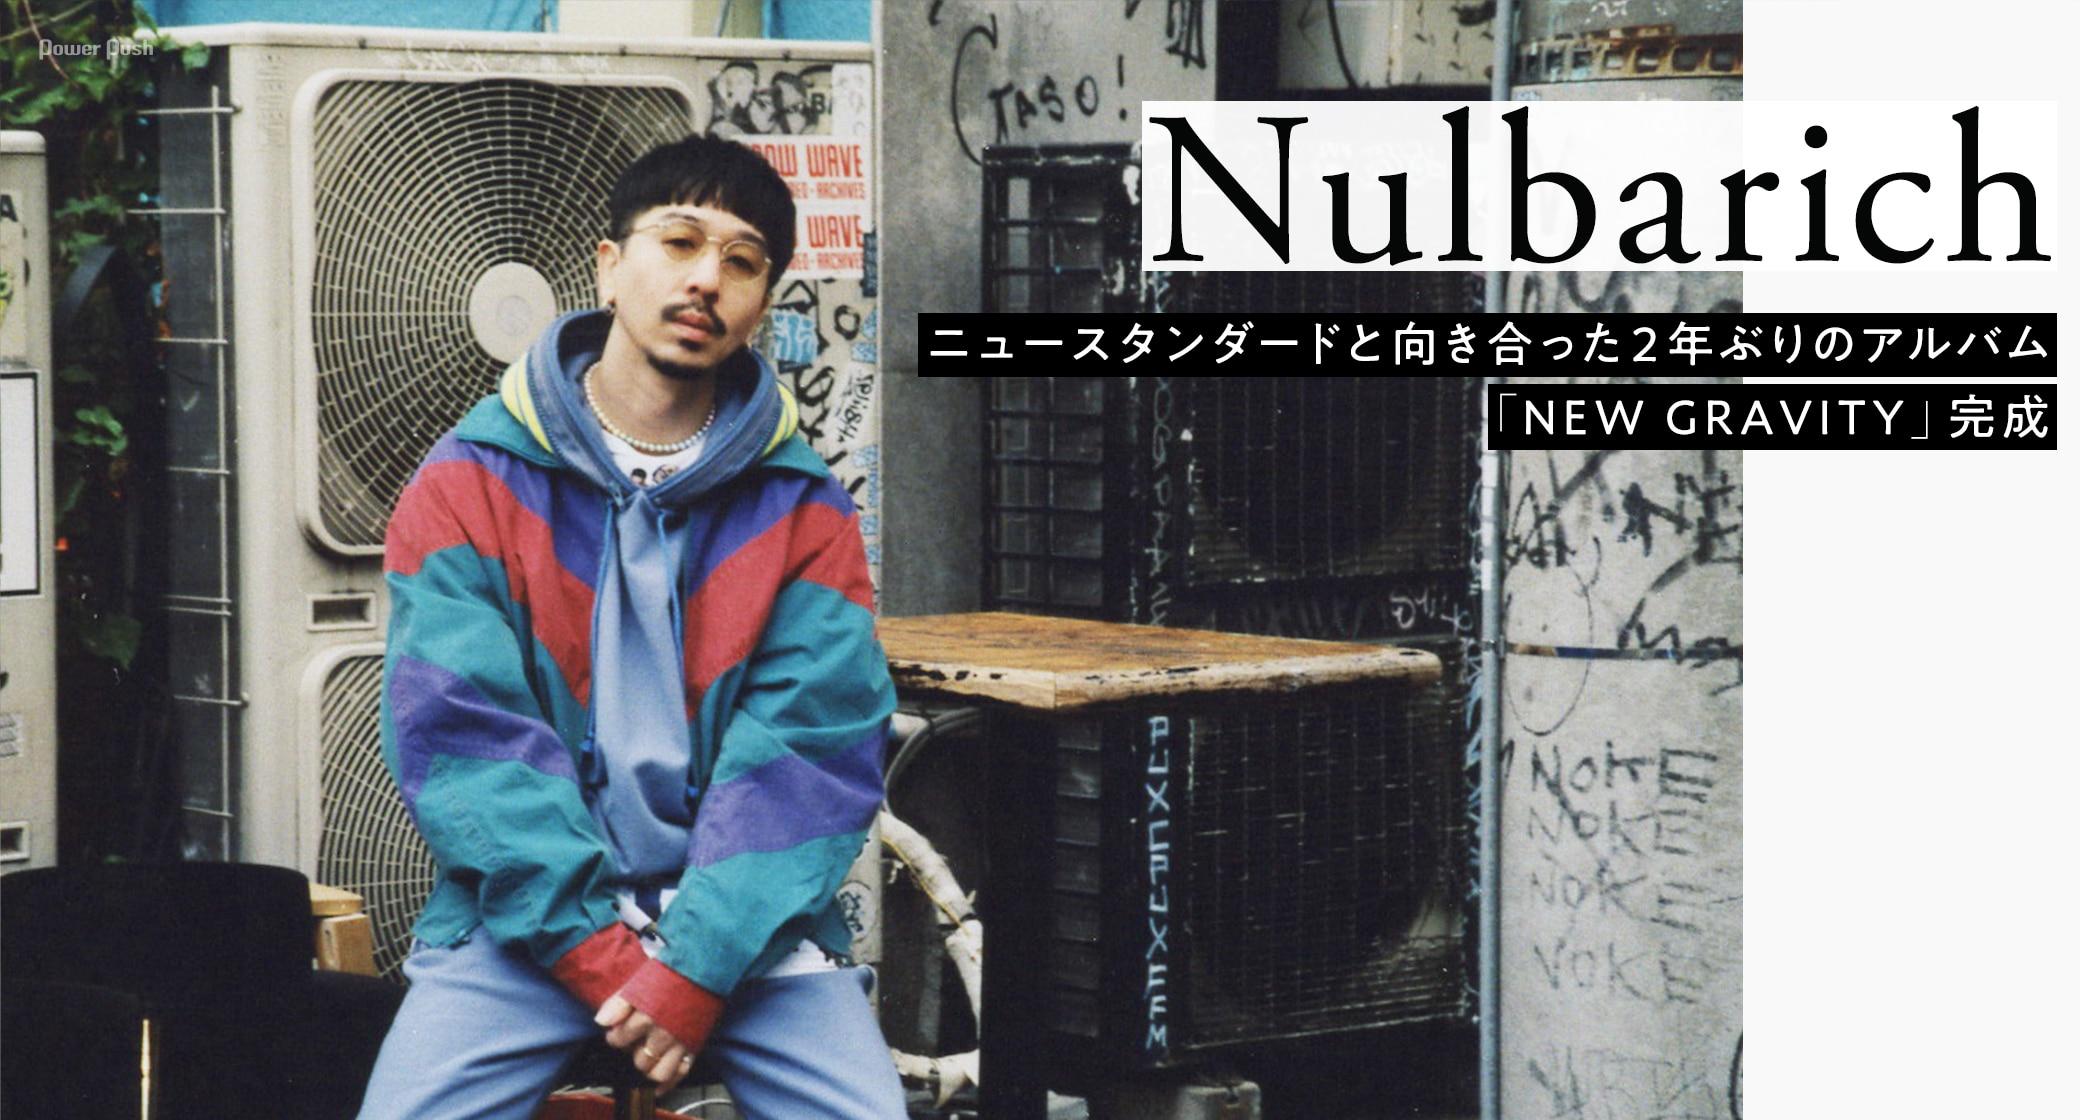 Nulbarich|ニュースタンダードと向き合った2年ぶりのアルバム「NEW GRAVITY」完成